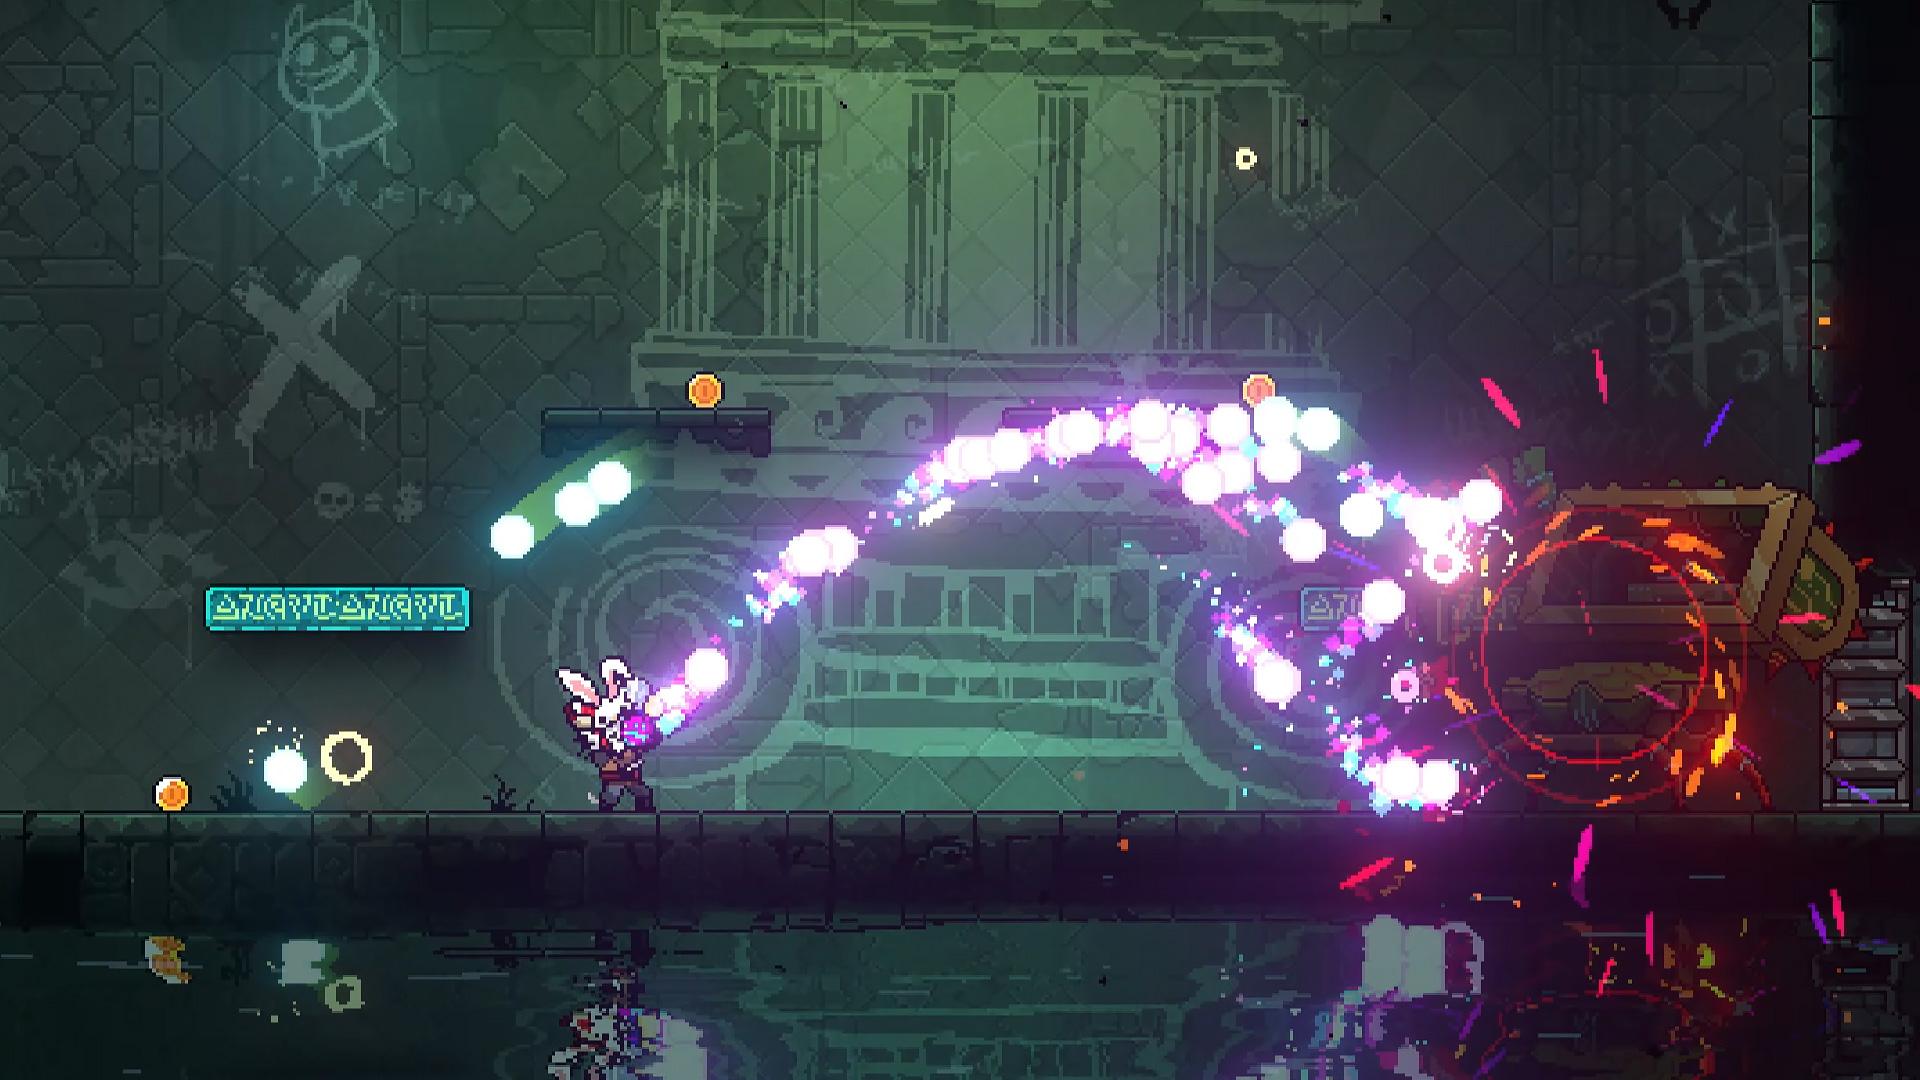 Neon Abyss Screenshots Image 26602 Xboxone Hq Com